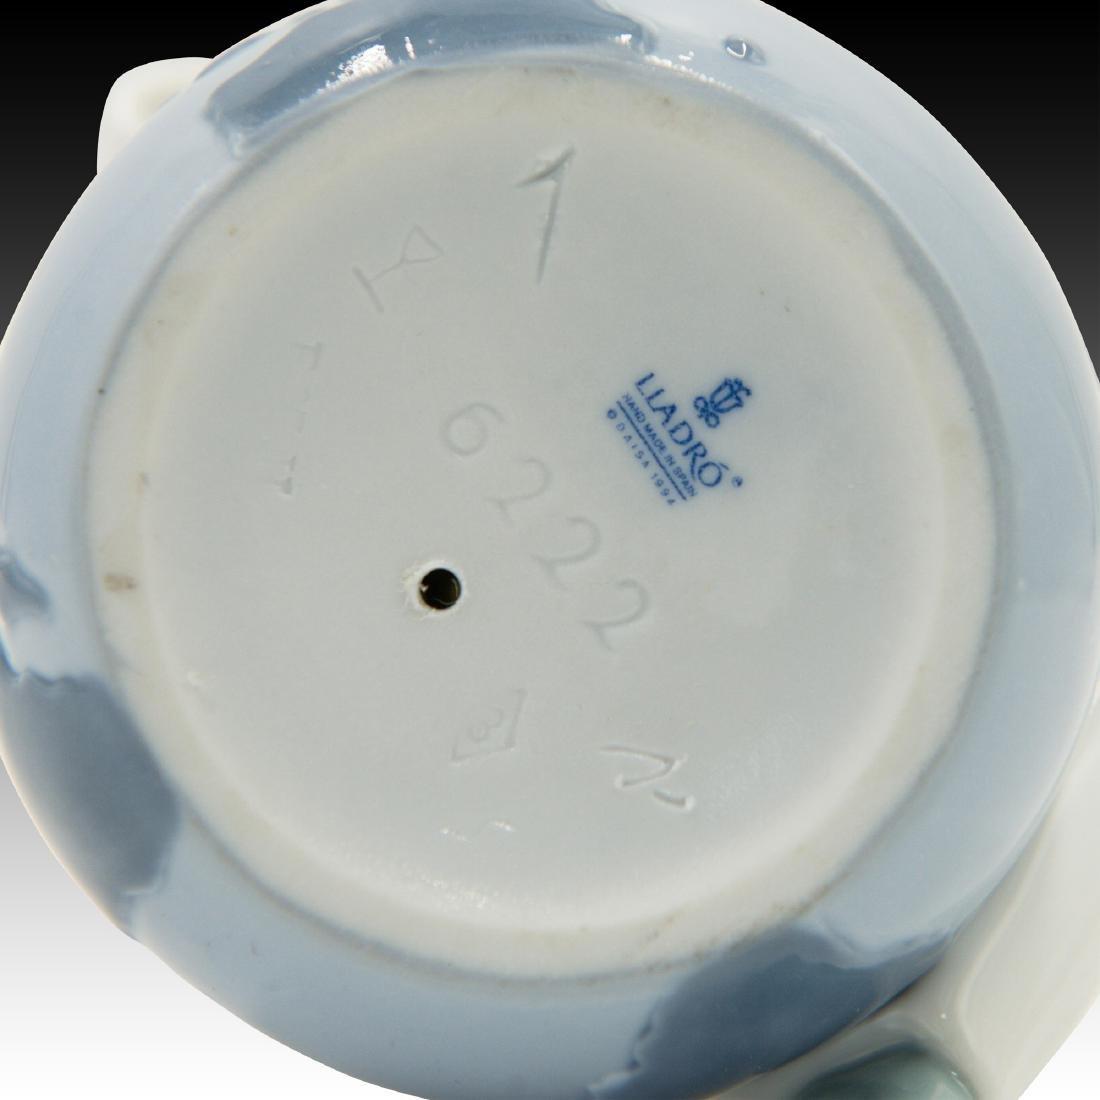 LLADRO CAPRICORN FIGURINE 6222 RETIRED 1997 - 3